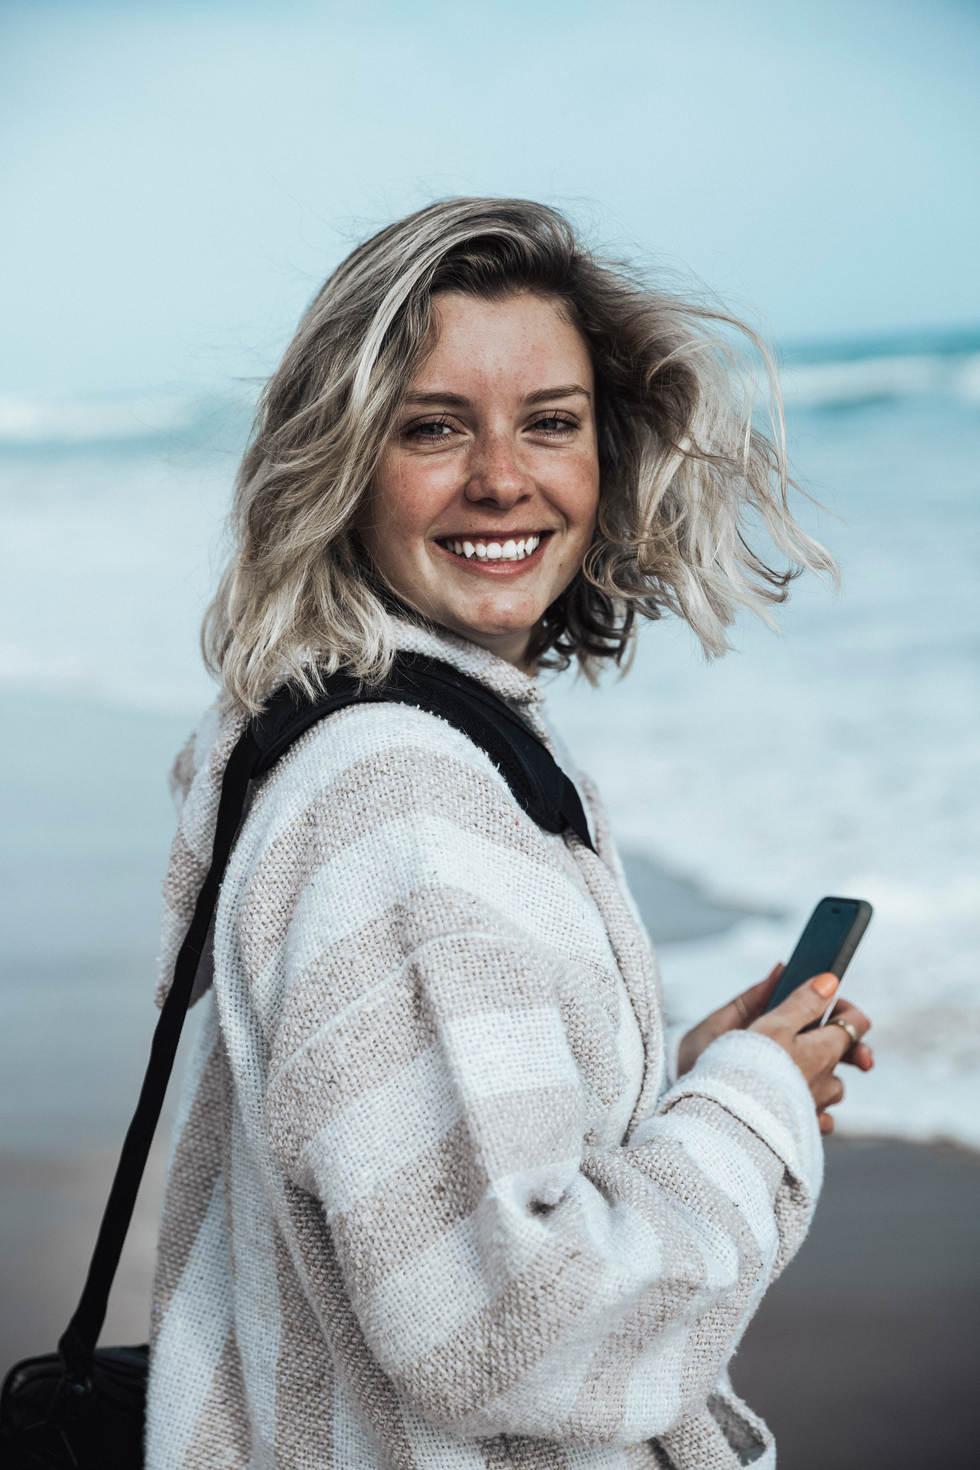 ruby ryan photo photograph photography beach girl portrait